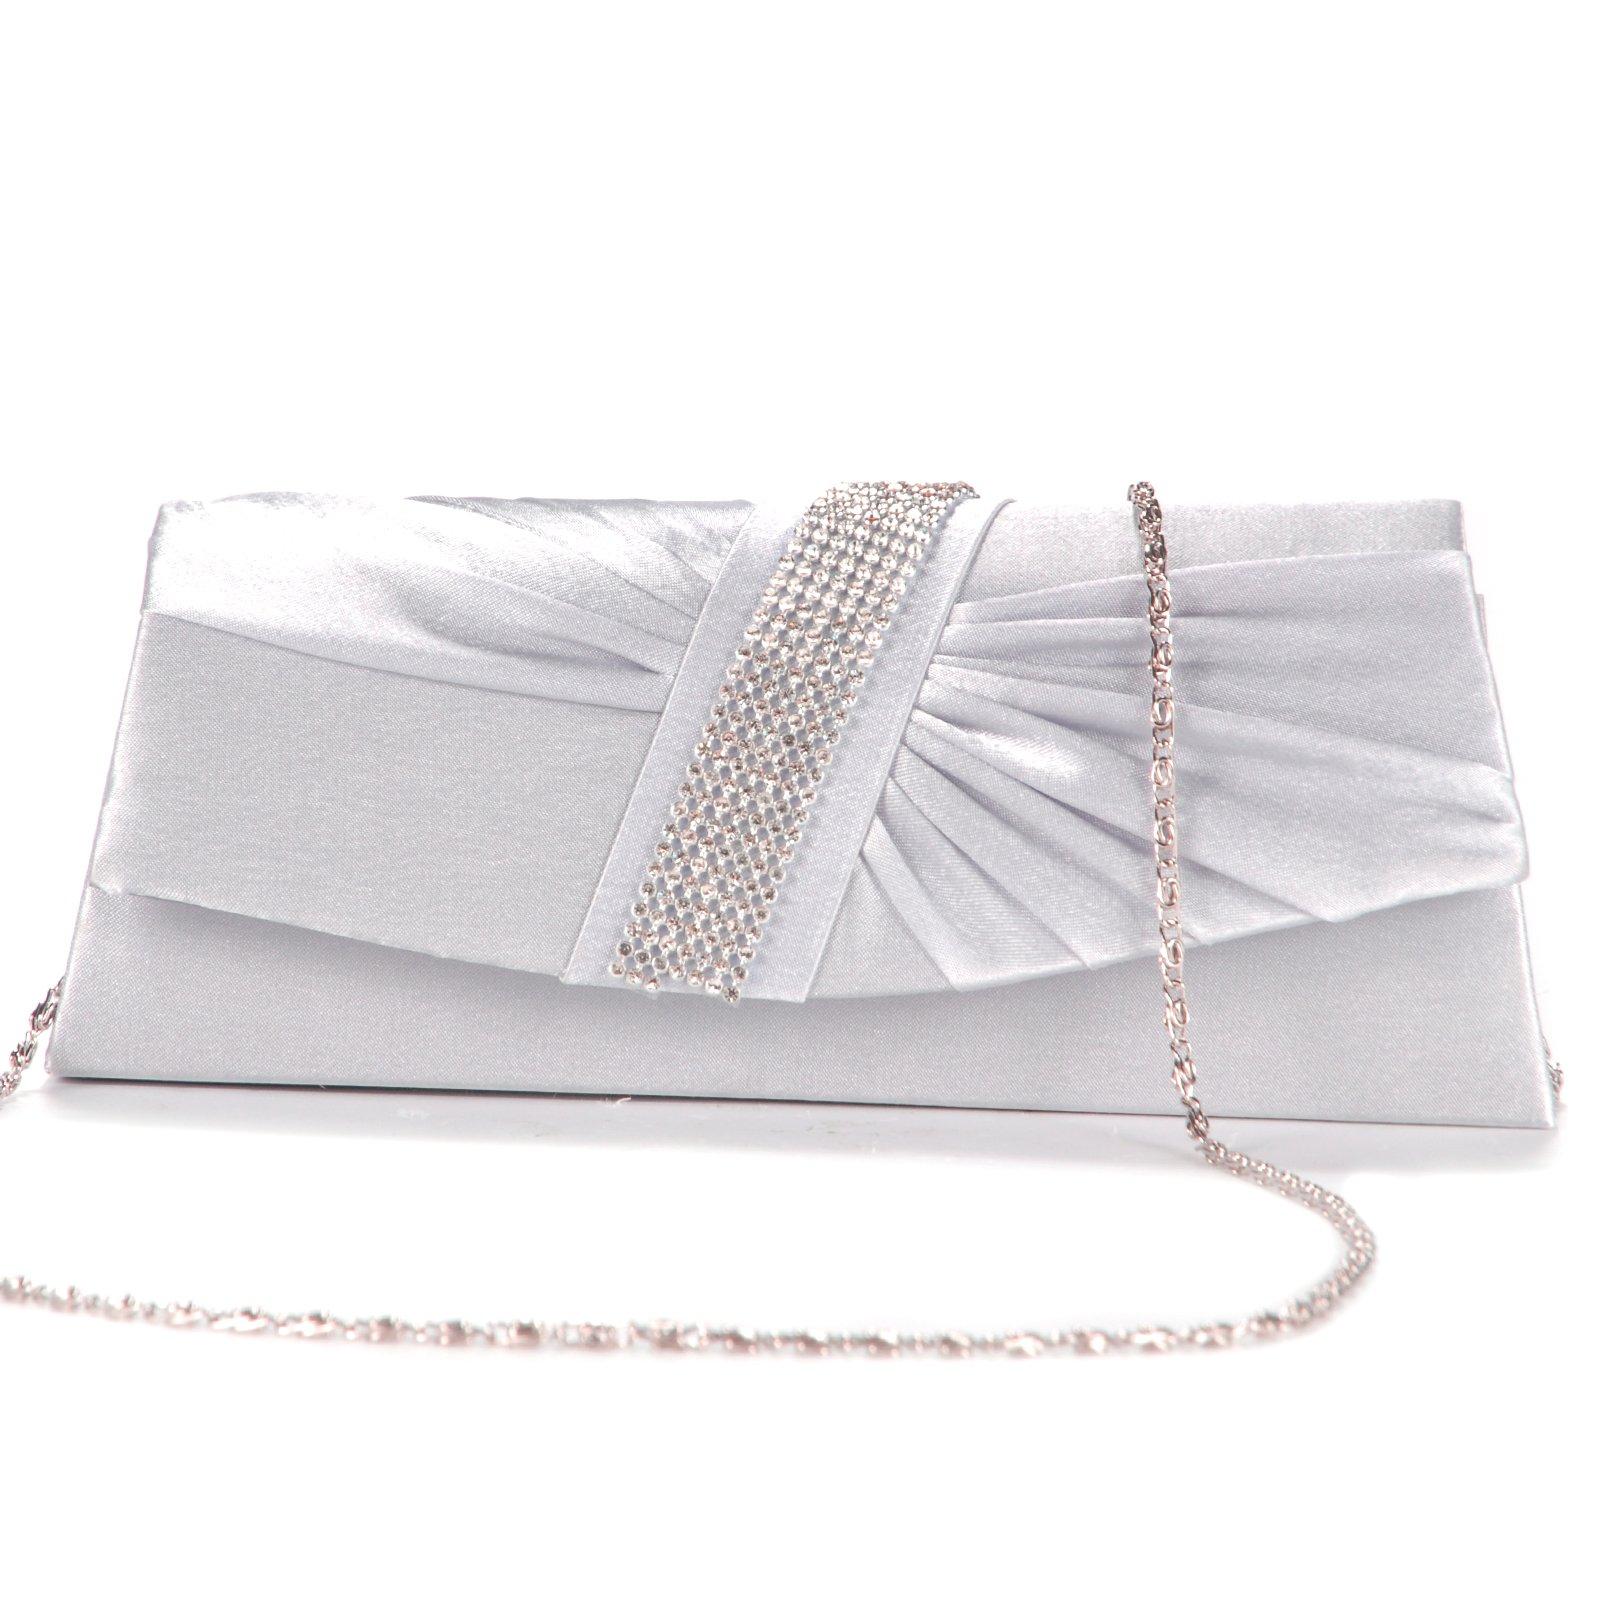 cd0fb165c076 TEXU mujeres cinta bolsa CLUTH plata diamante Rhinestones bolso bolsa forma  satén plisado trapecio Rabat Crimp de Strass plata